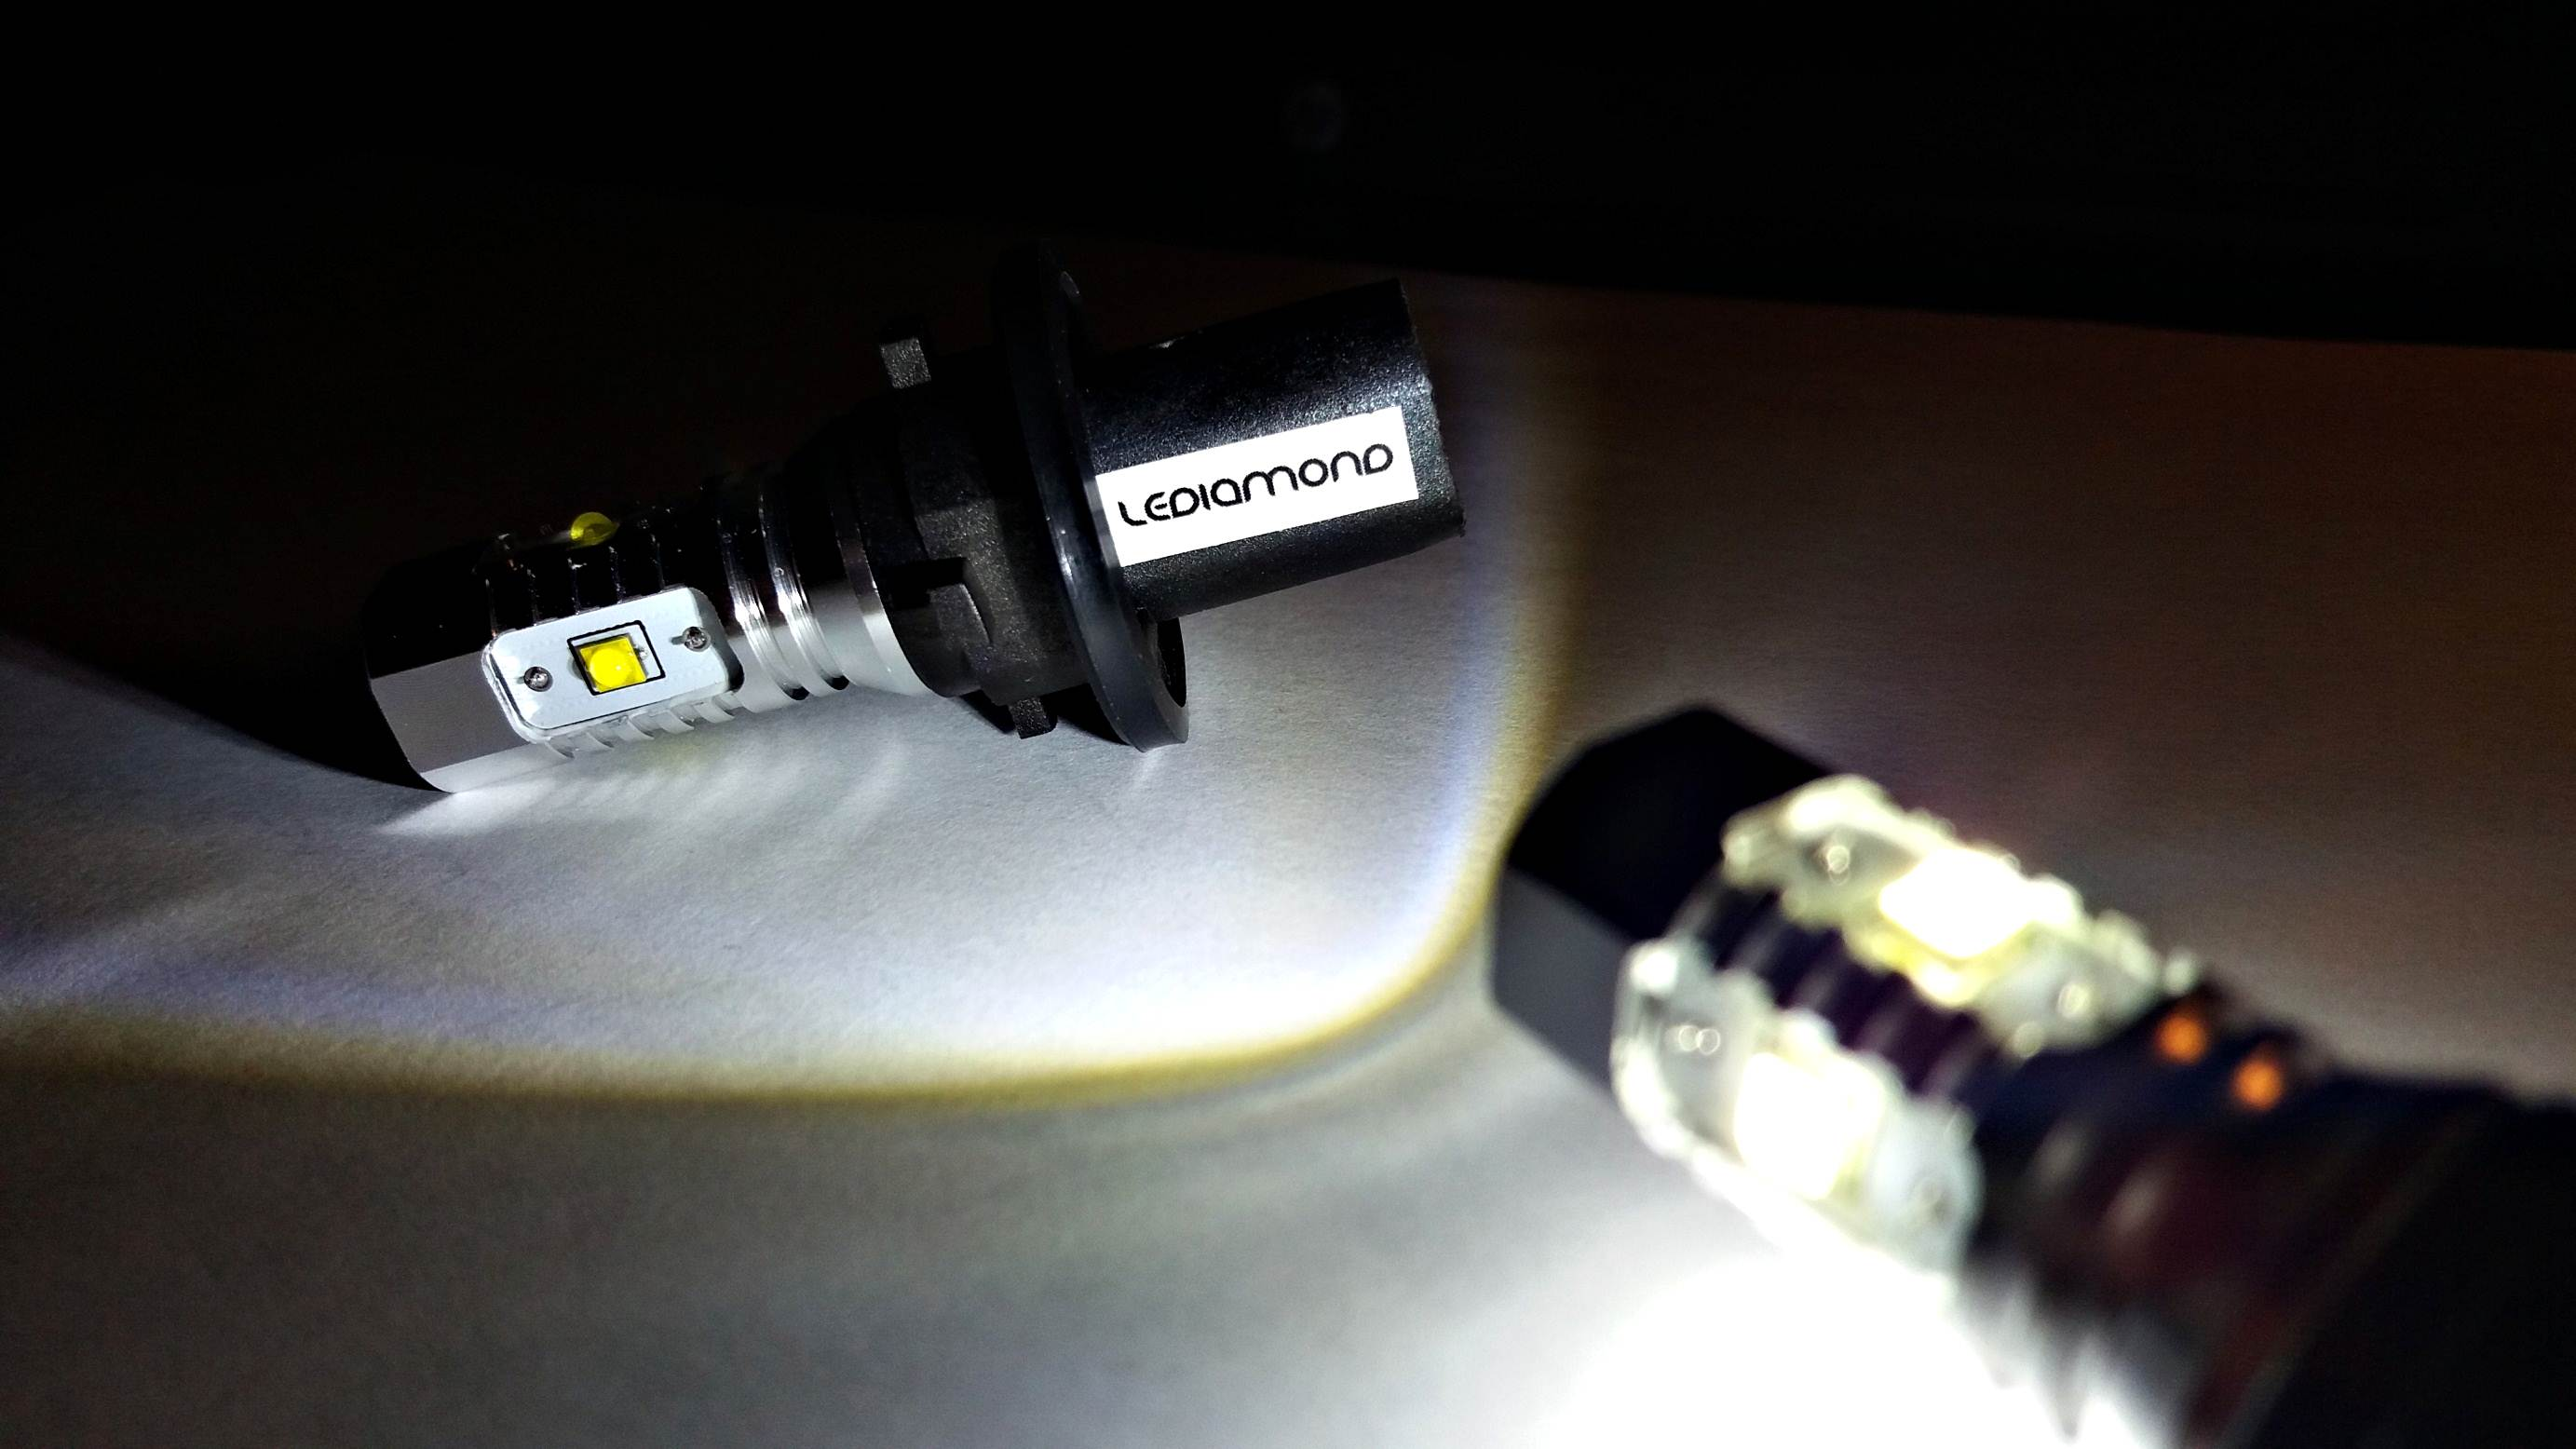 LEDIAMOND HP24W EFECTO 30W CREE EEUU LUZ2